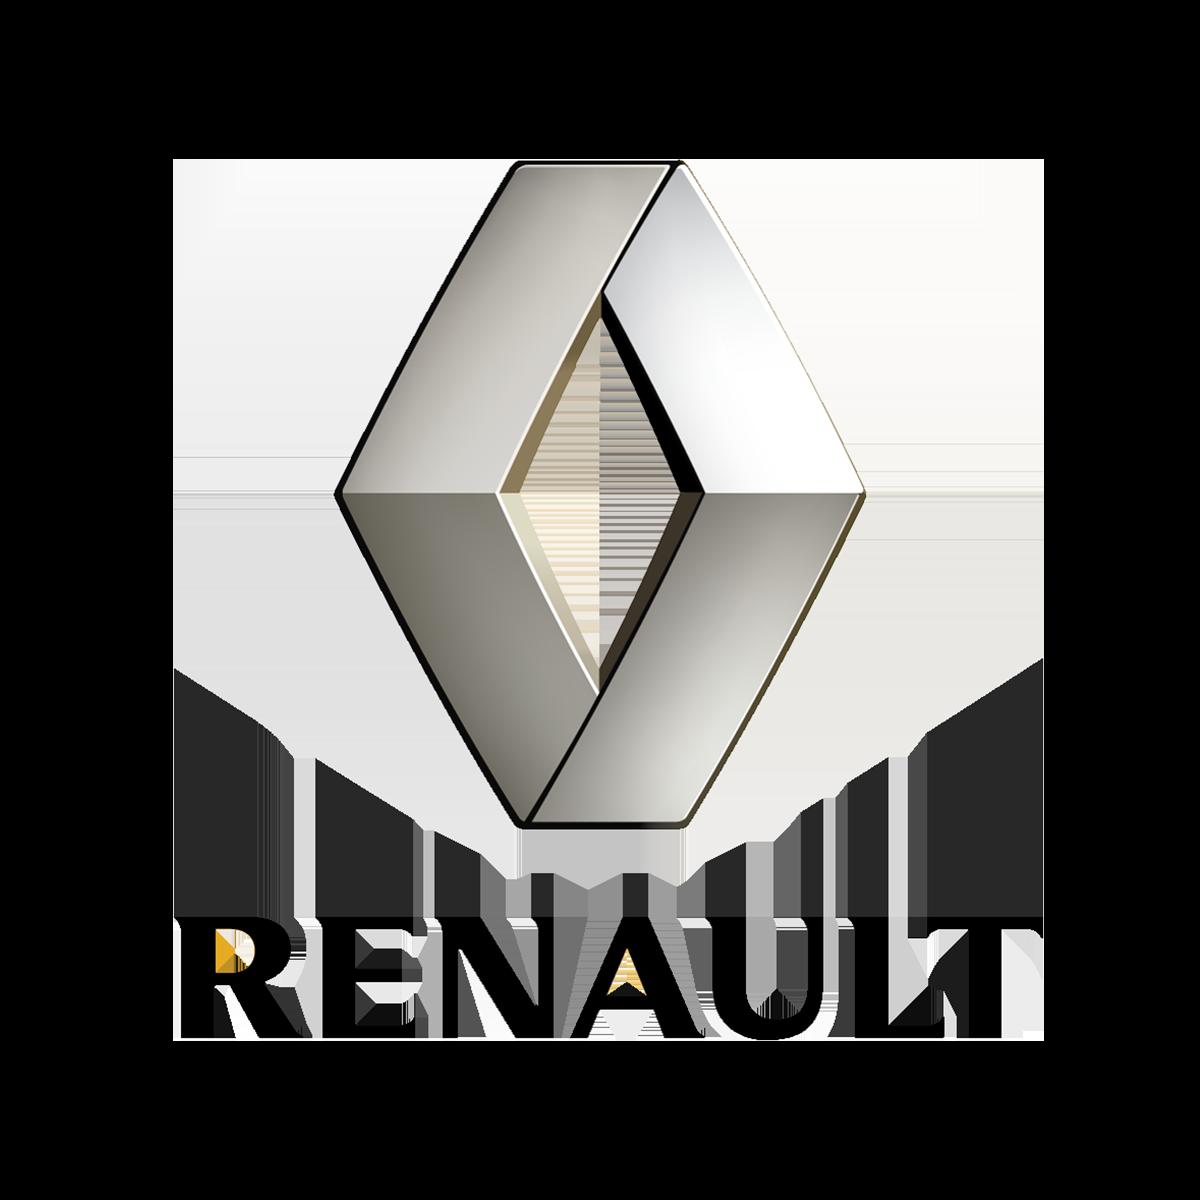 RENAULT_fine